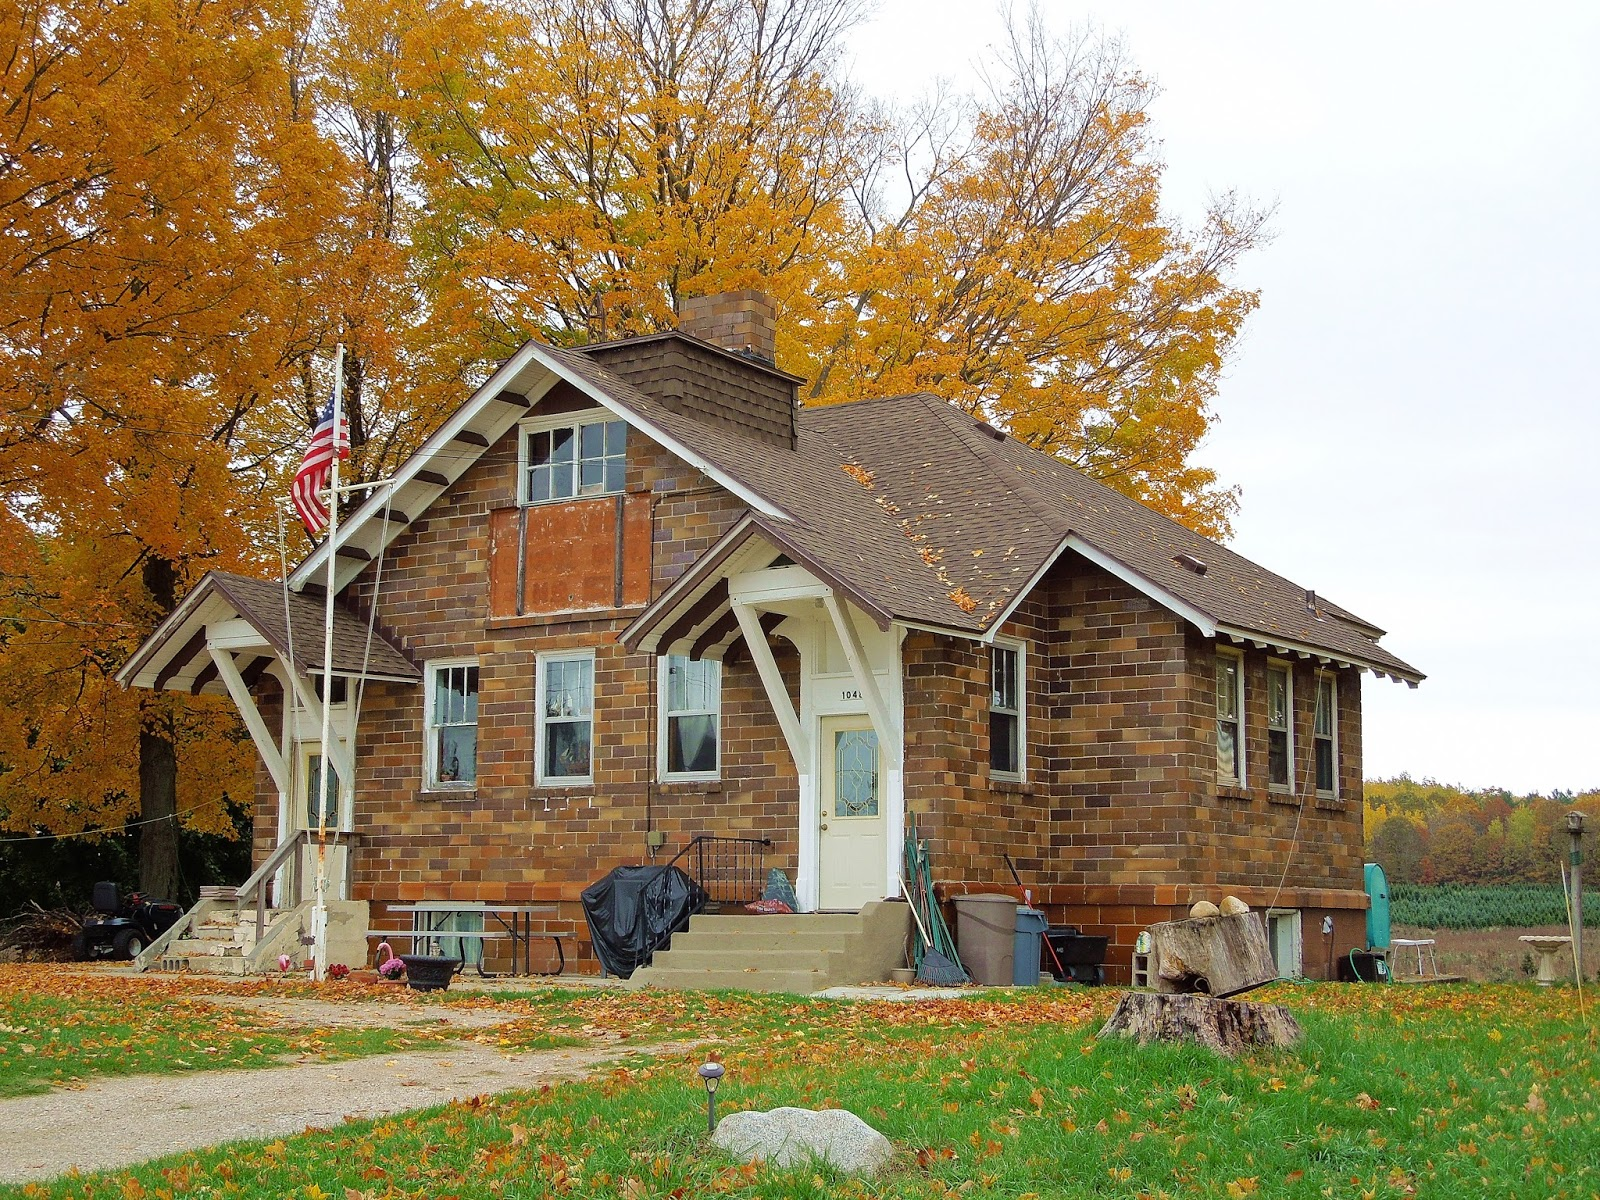 Michigan mason county custer - Mason County